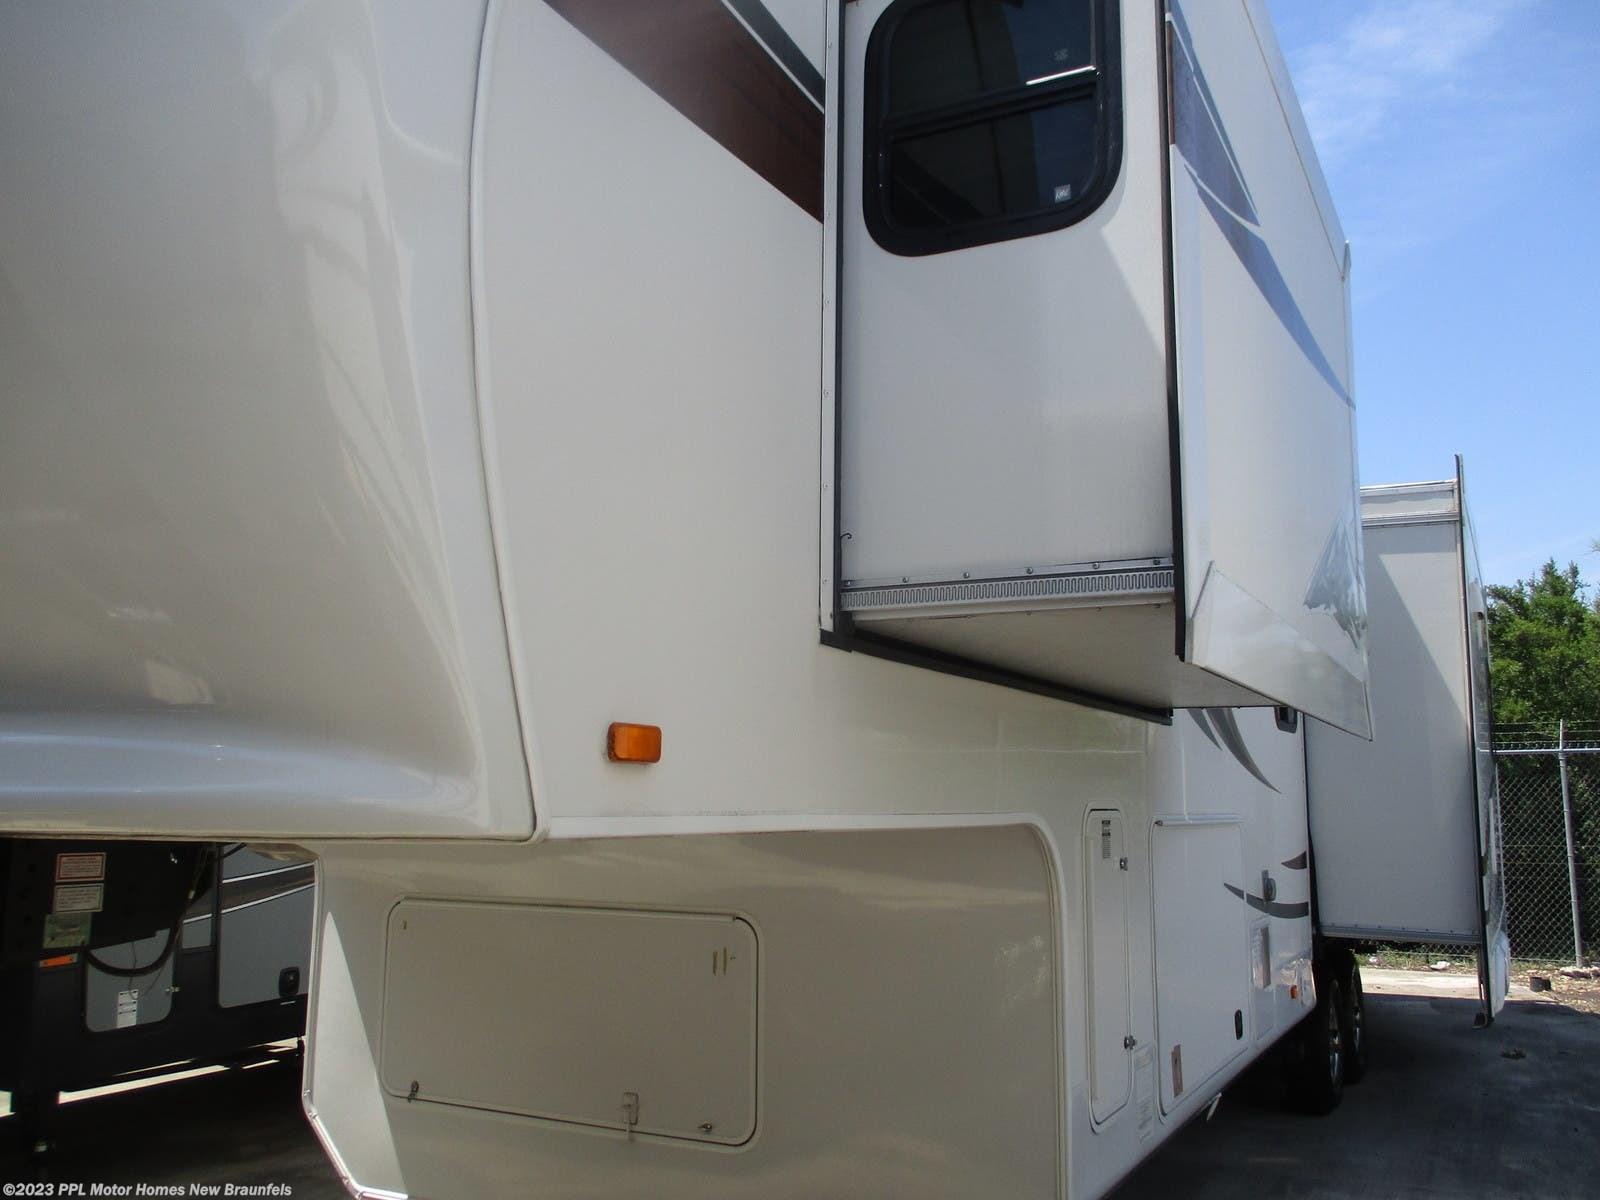 2012 Jayco RV Pinnacle 34 RLTS for Sale in New Braunfels, TX 78130 | F132NB